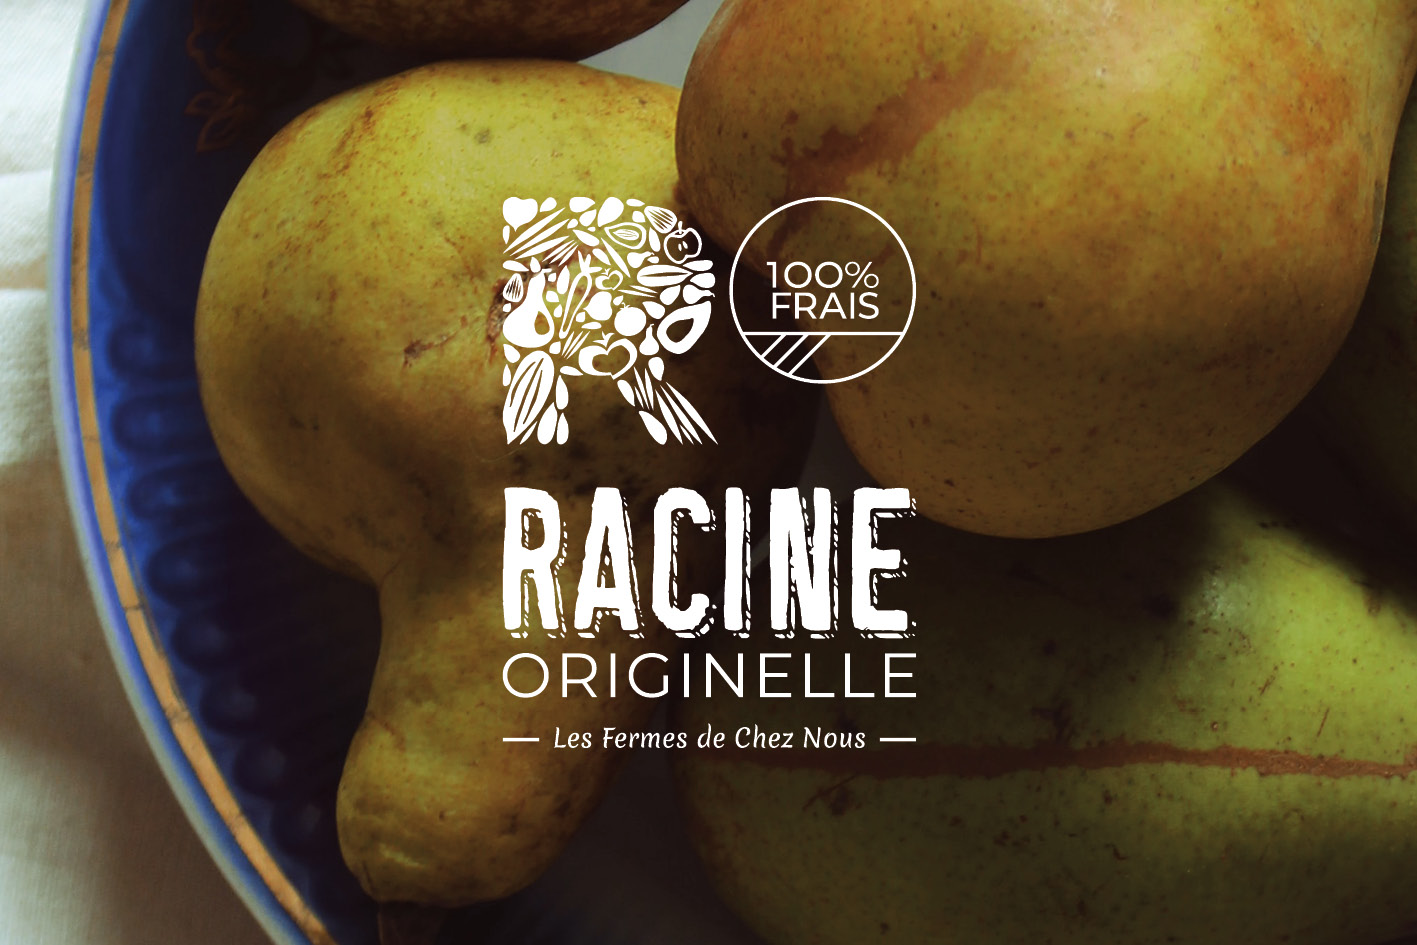 Racine Originelle